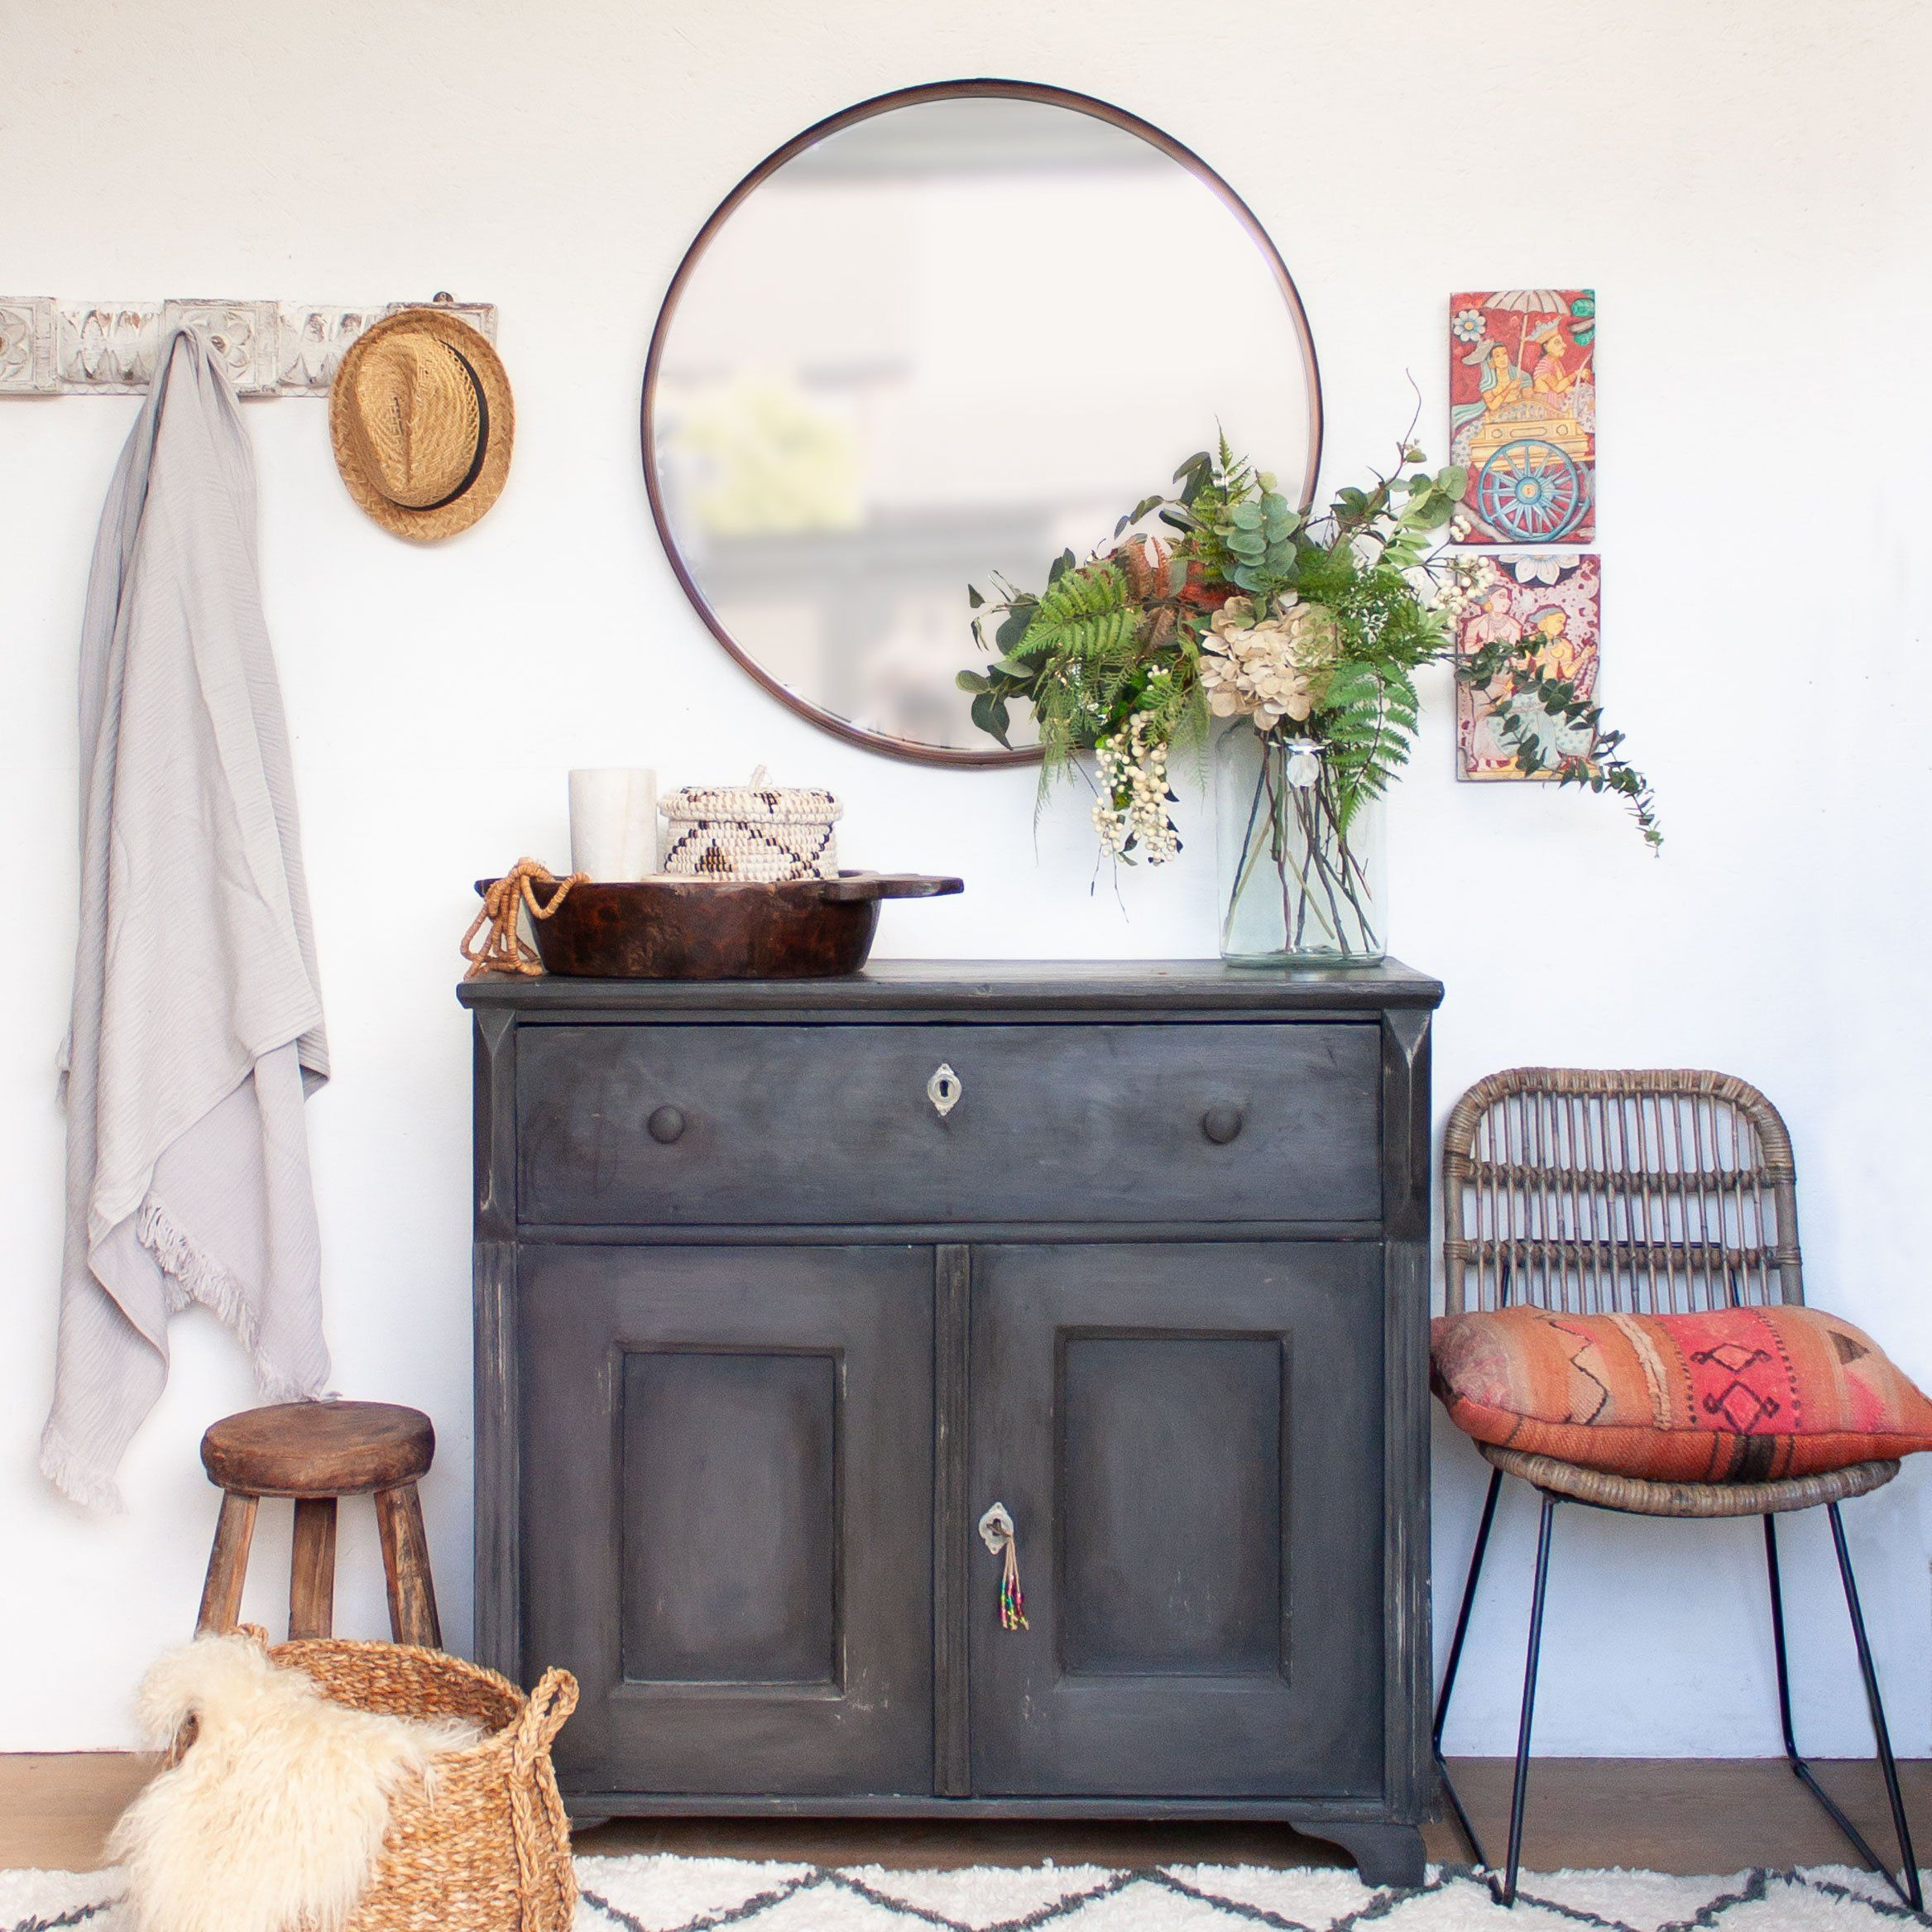 Photo of Vintage Black Wooden Cupboard